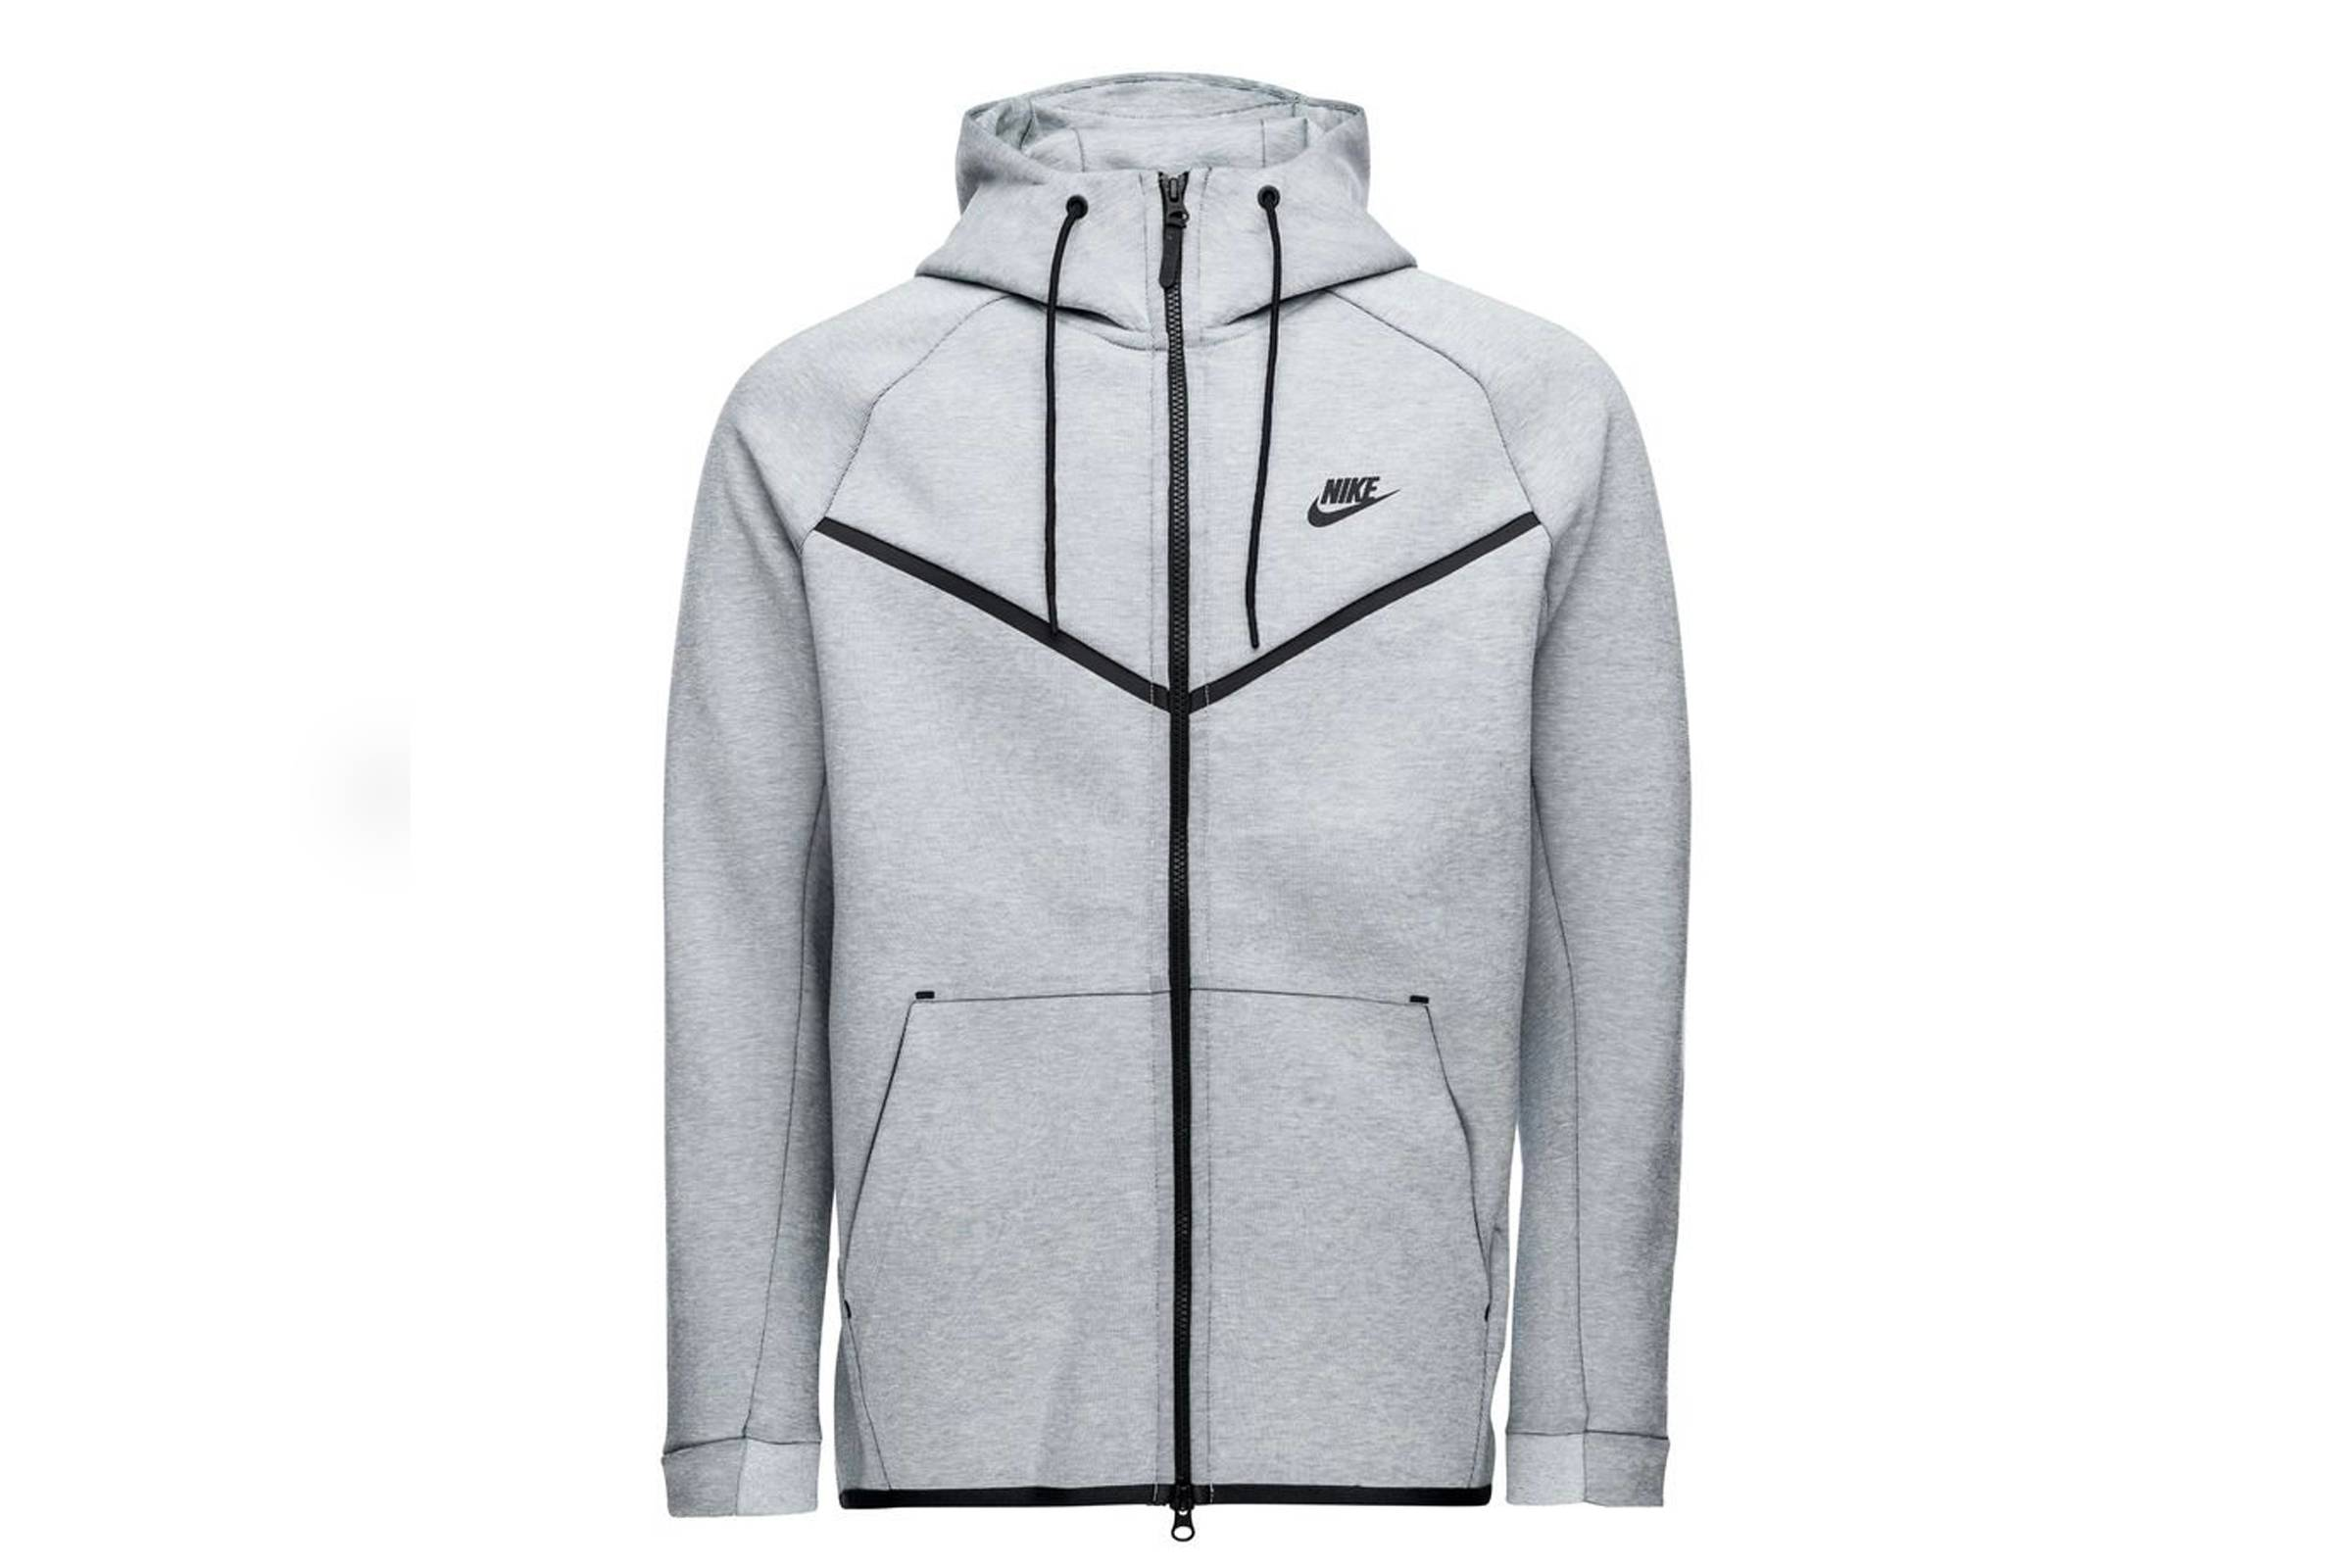 8. Nike Tech Fleece Hoodie